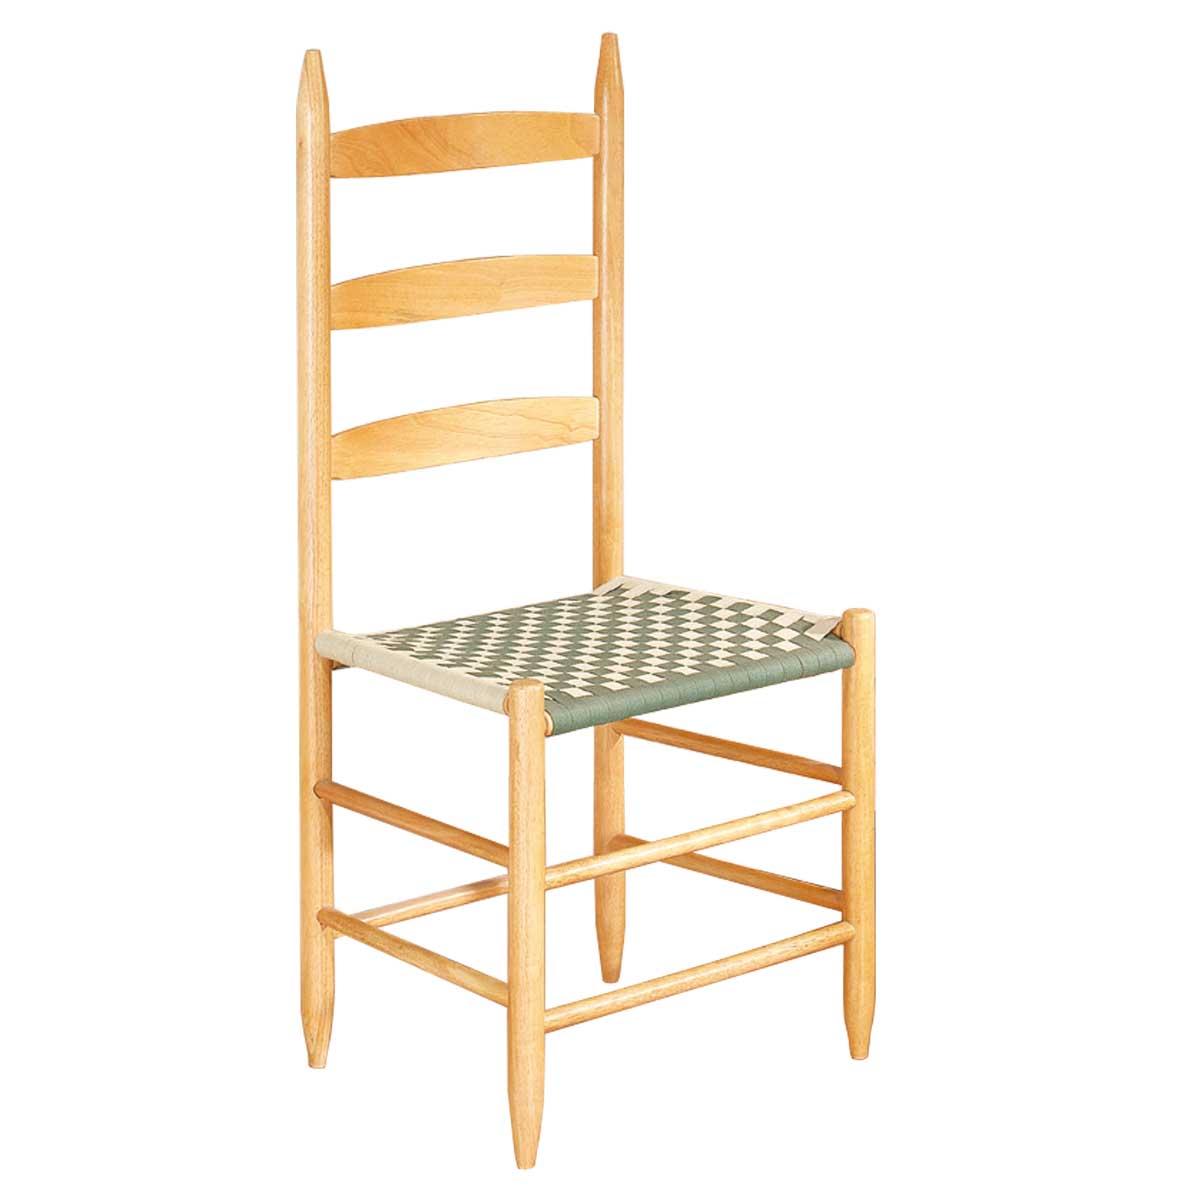 "Kitchen Chairs Ladderback Green Beechwood 42.5"" H"